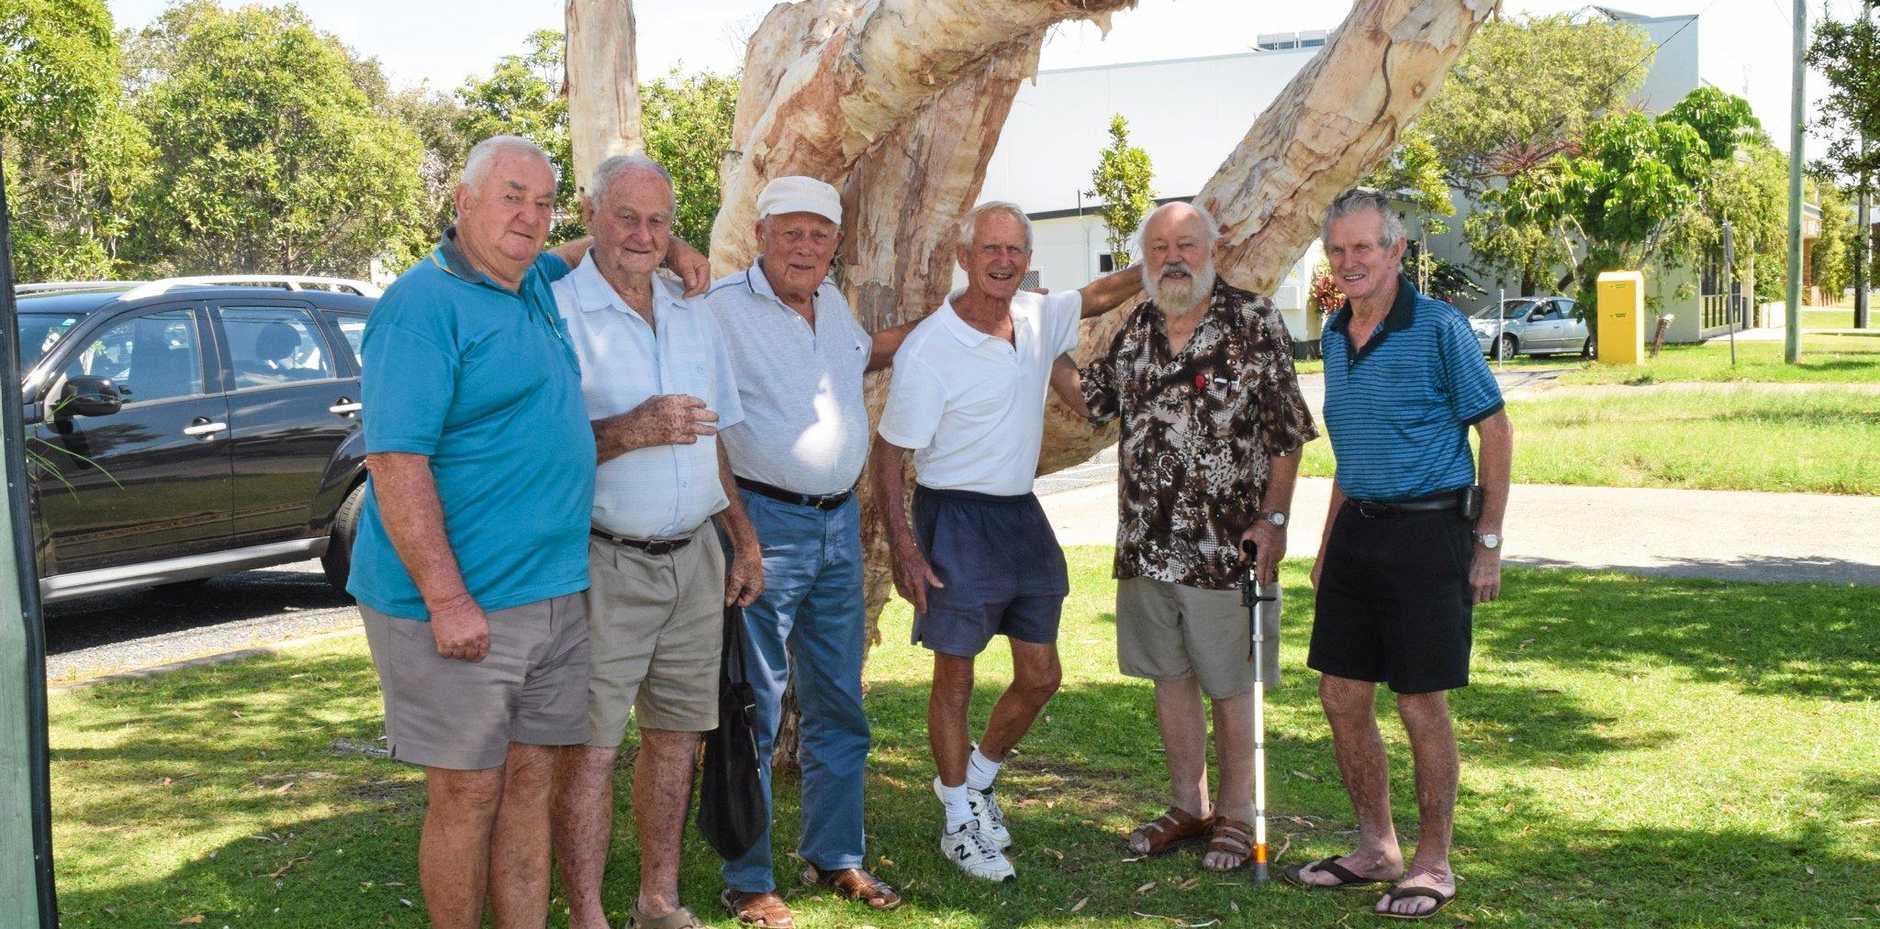 LOCAL LEGENDS: Woolgoolga Men's Club president Trevor Goldthorpe with member Jack Goodenough, treasurer Ian MacAndrew, secretary Barry Scholfield and members Errol Stevens and Noel Bultitude.